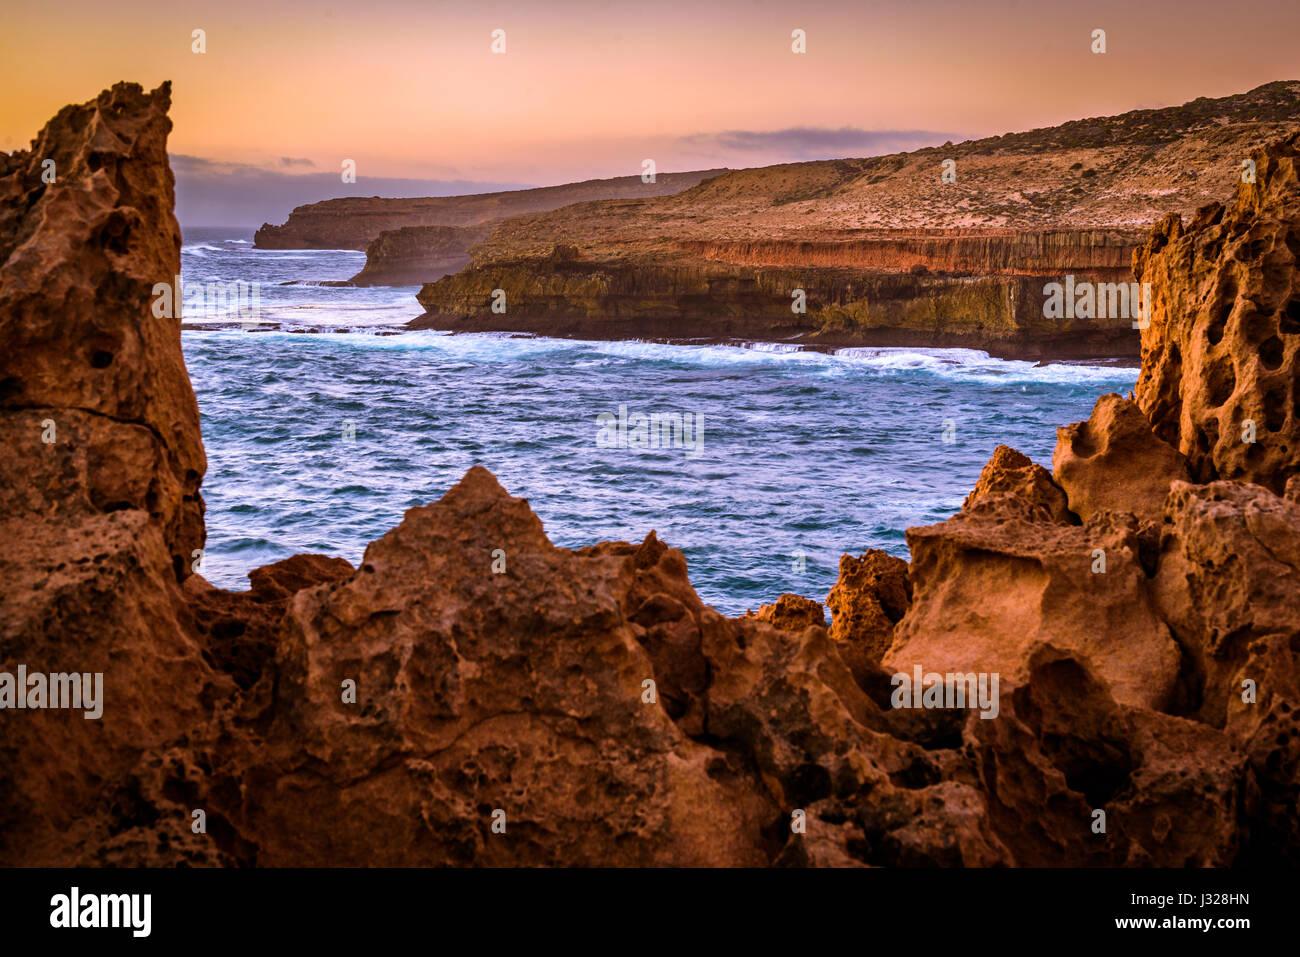 Cape Bauer at Eyre Peninsula, South Australia - Stock Image